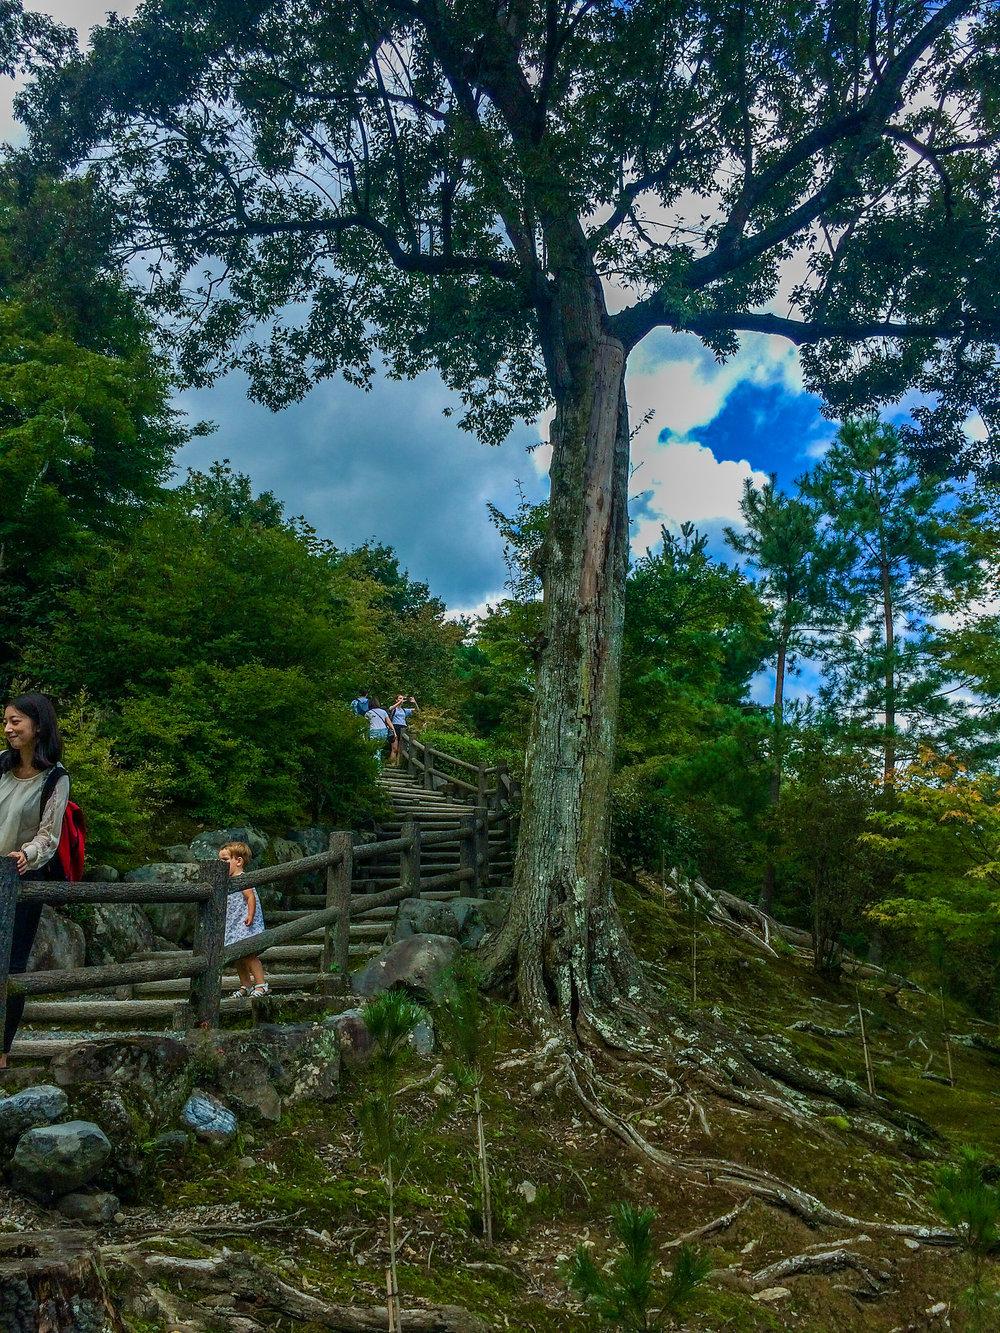 29730039493_e499bc18a9_k.jpgA Guide to Finding your Zen in the Peaceful and Serene Gardens of Tenryu-ji Temple Arashiyama